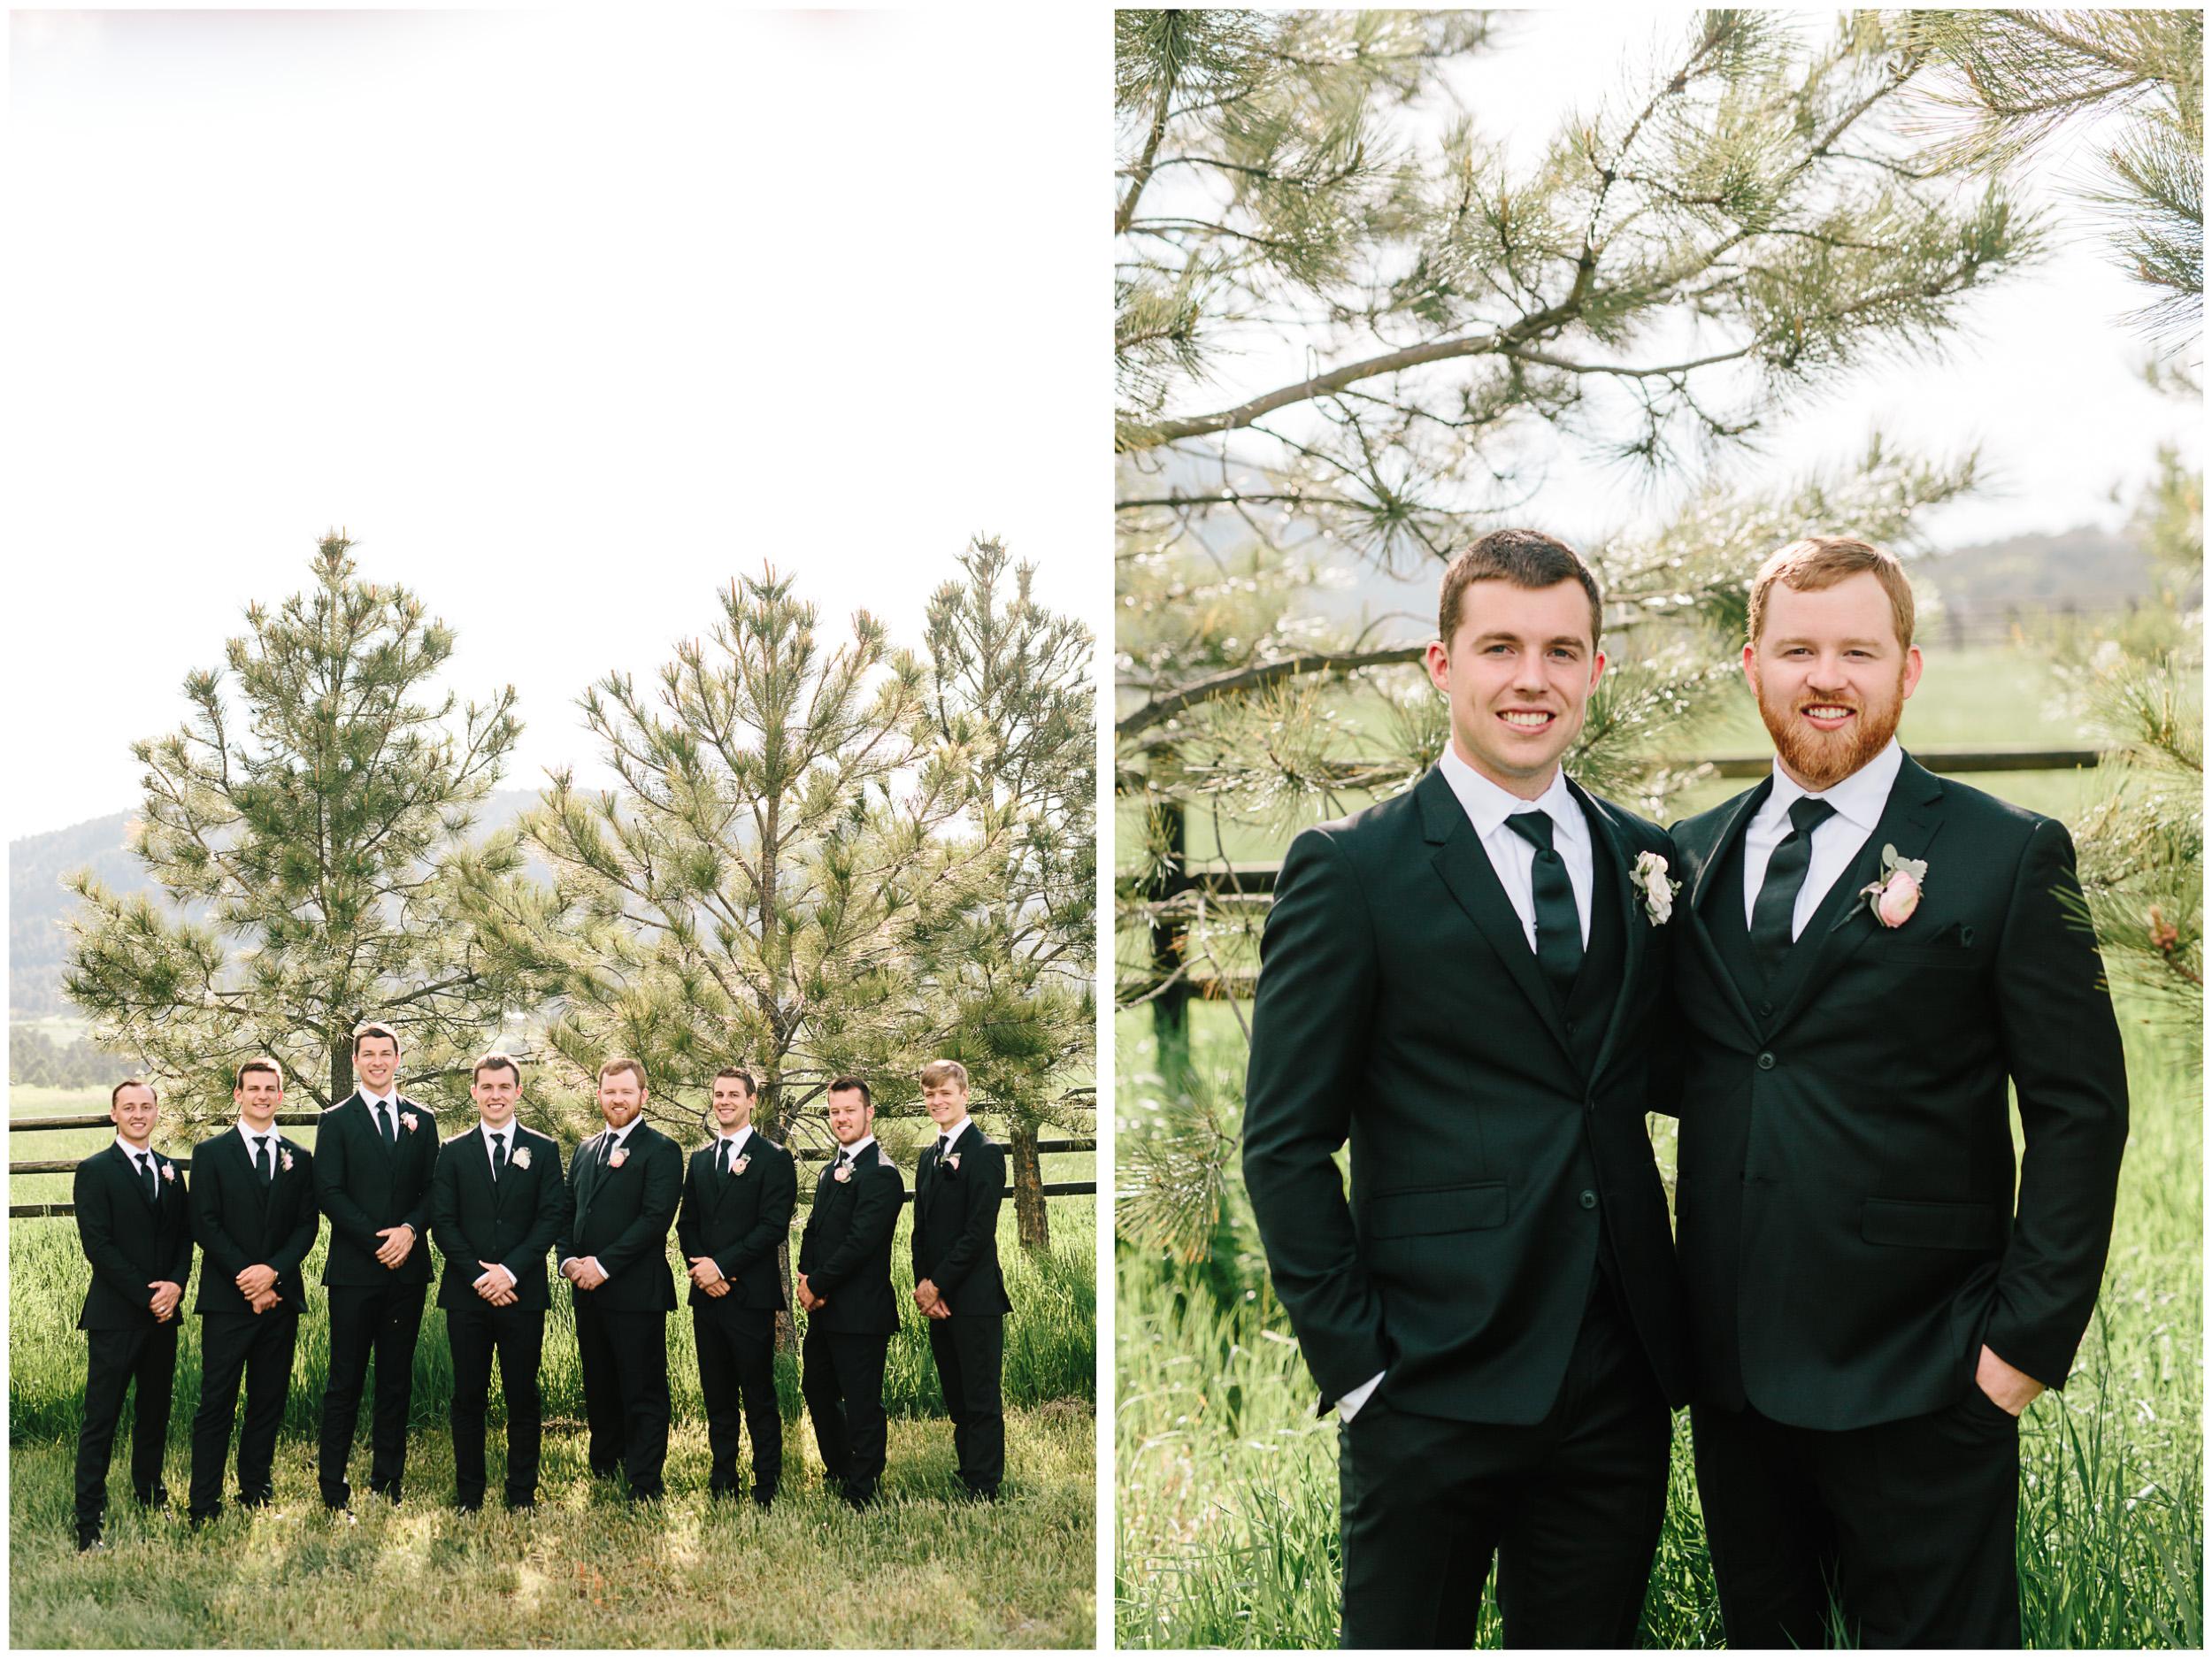 spruce_mountain_ranch_wedding_42a.jpg